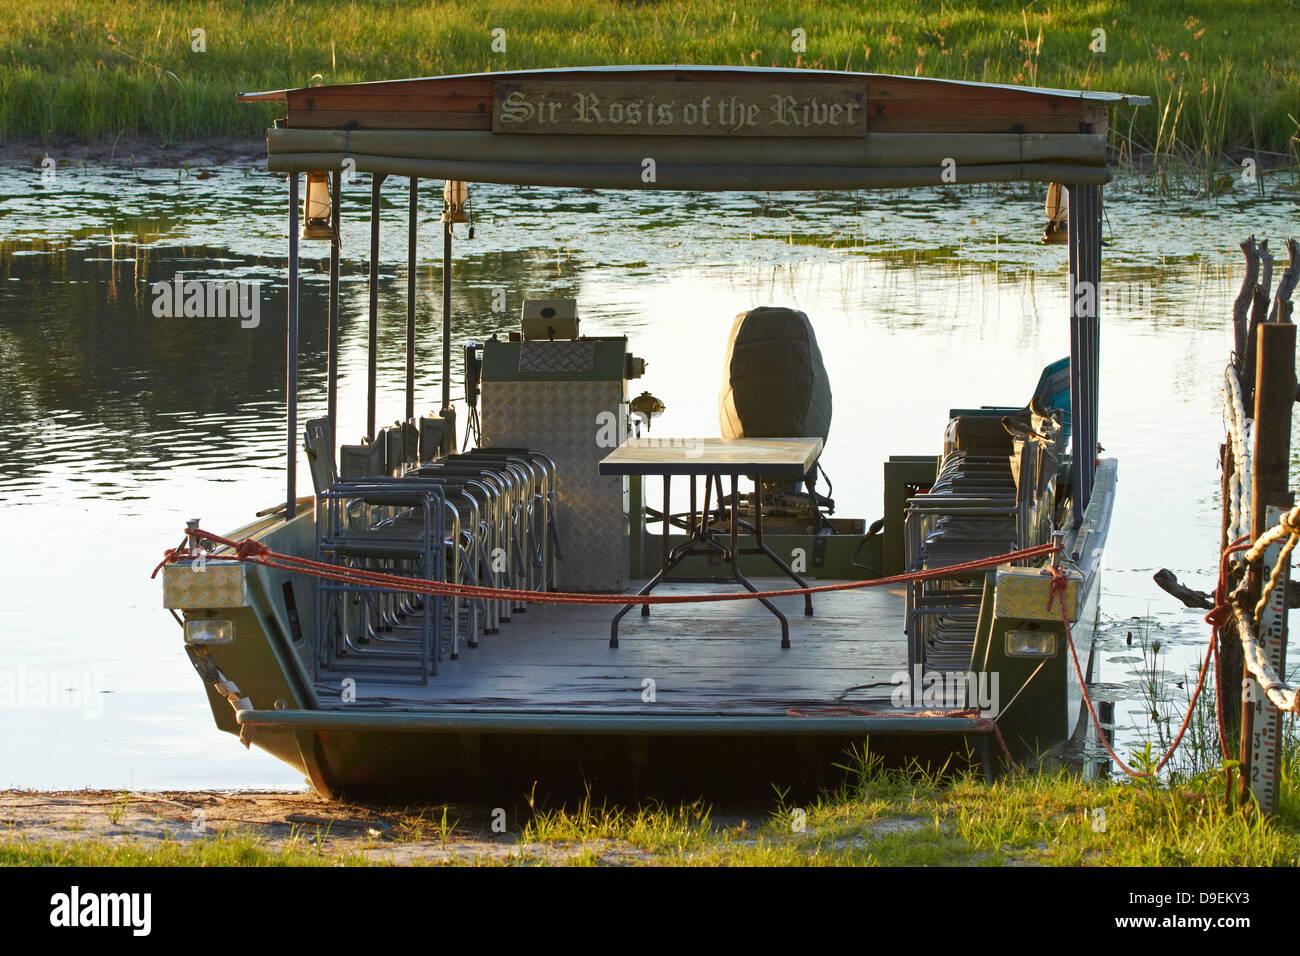 'Sir Rosis of the River' boat on banks of Thamalakane River, Okavango River Lodge, Maun, Okavango Delta, - Stock Image